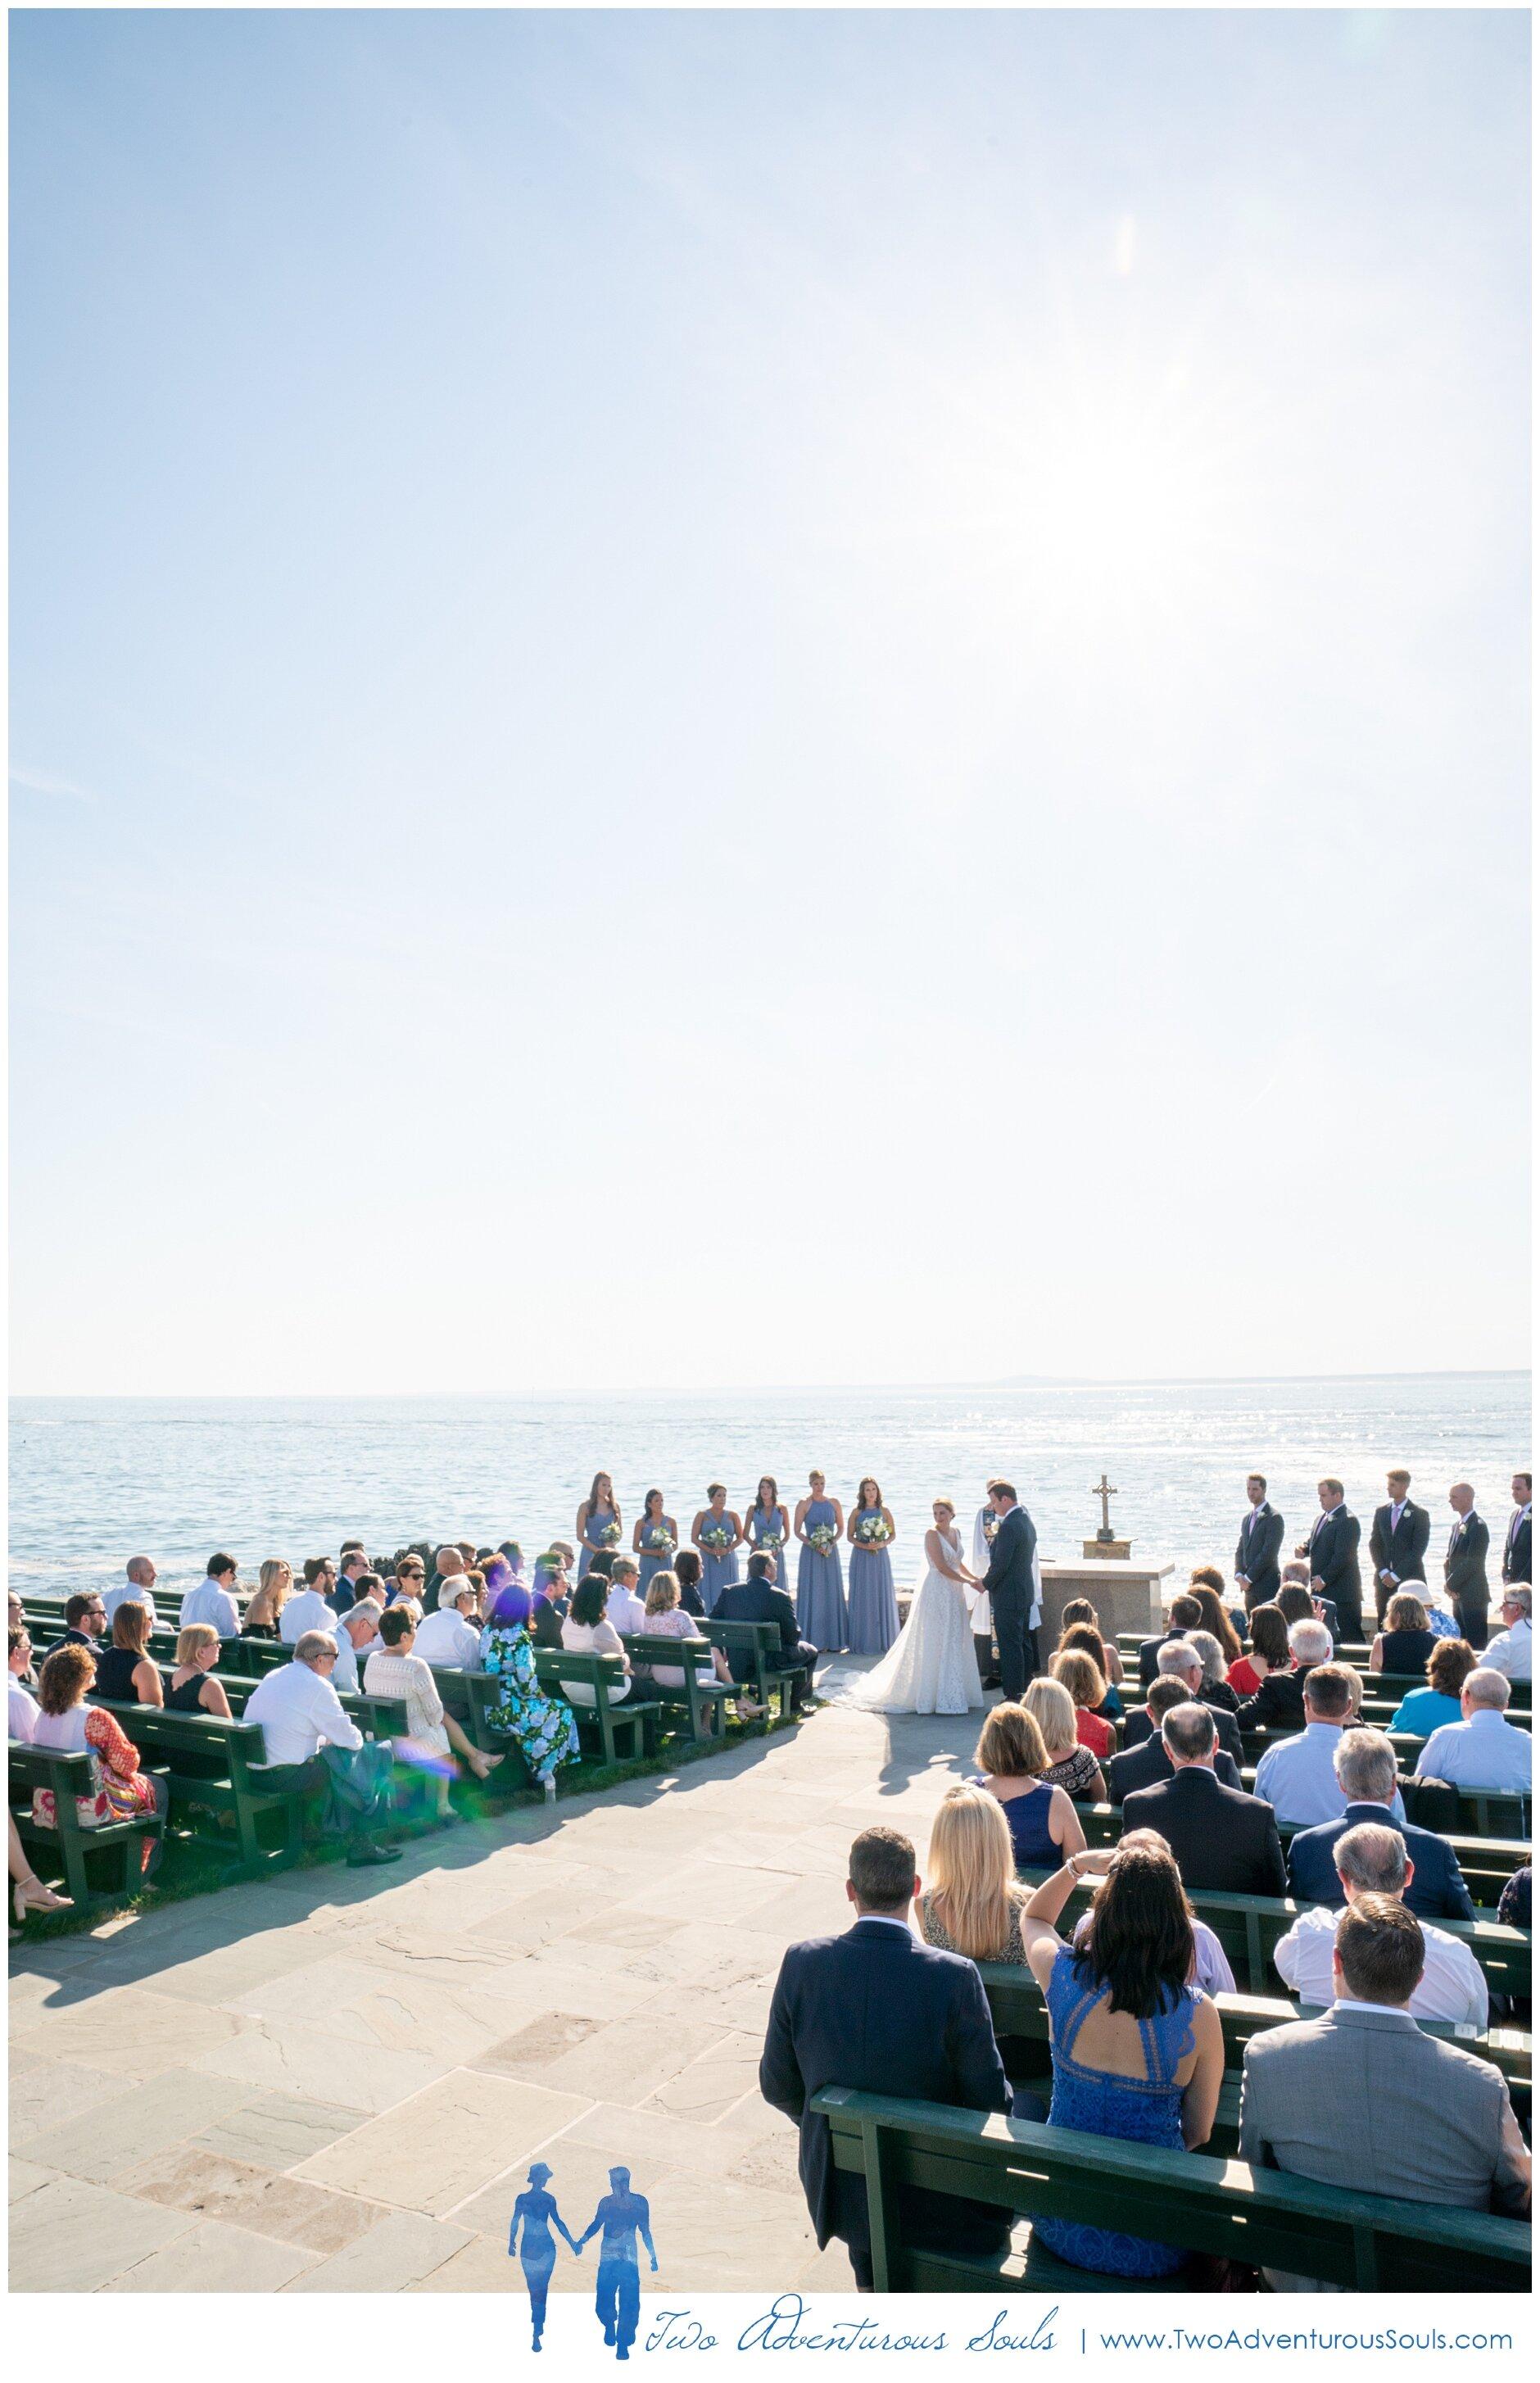 Breakwater Inn and Spa Wedding Photographers, Kennebunkport Wedding Photographers, Two Adventurous Souls- 092119_0033.jpg